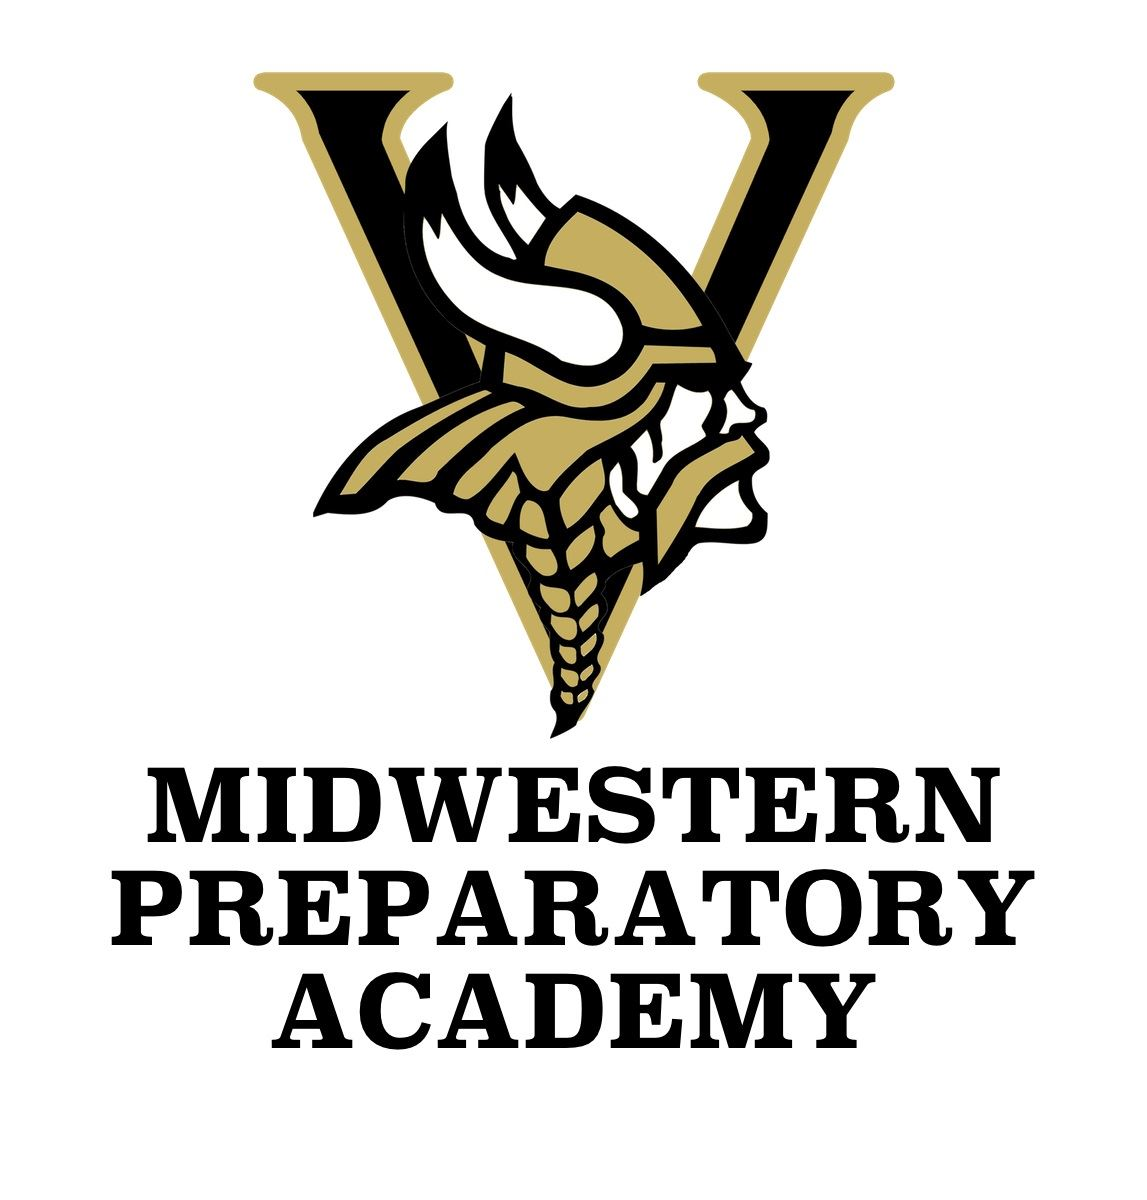 Midwestern Preparatory Academy - Post-Secondary Football